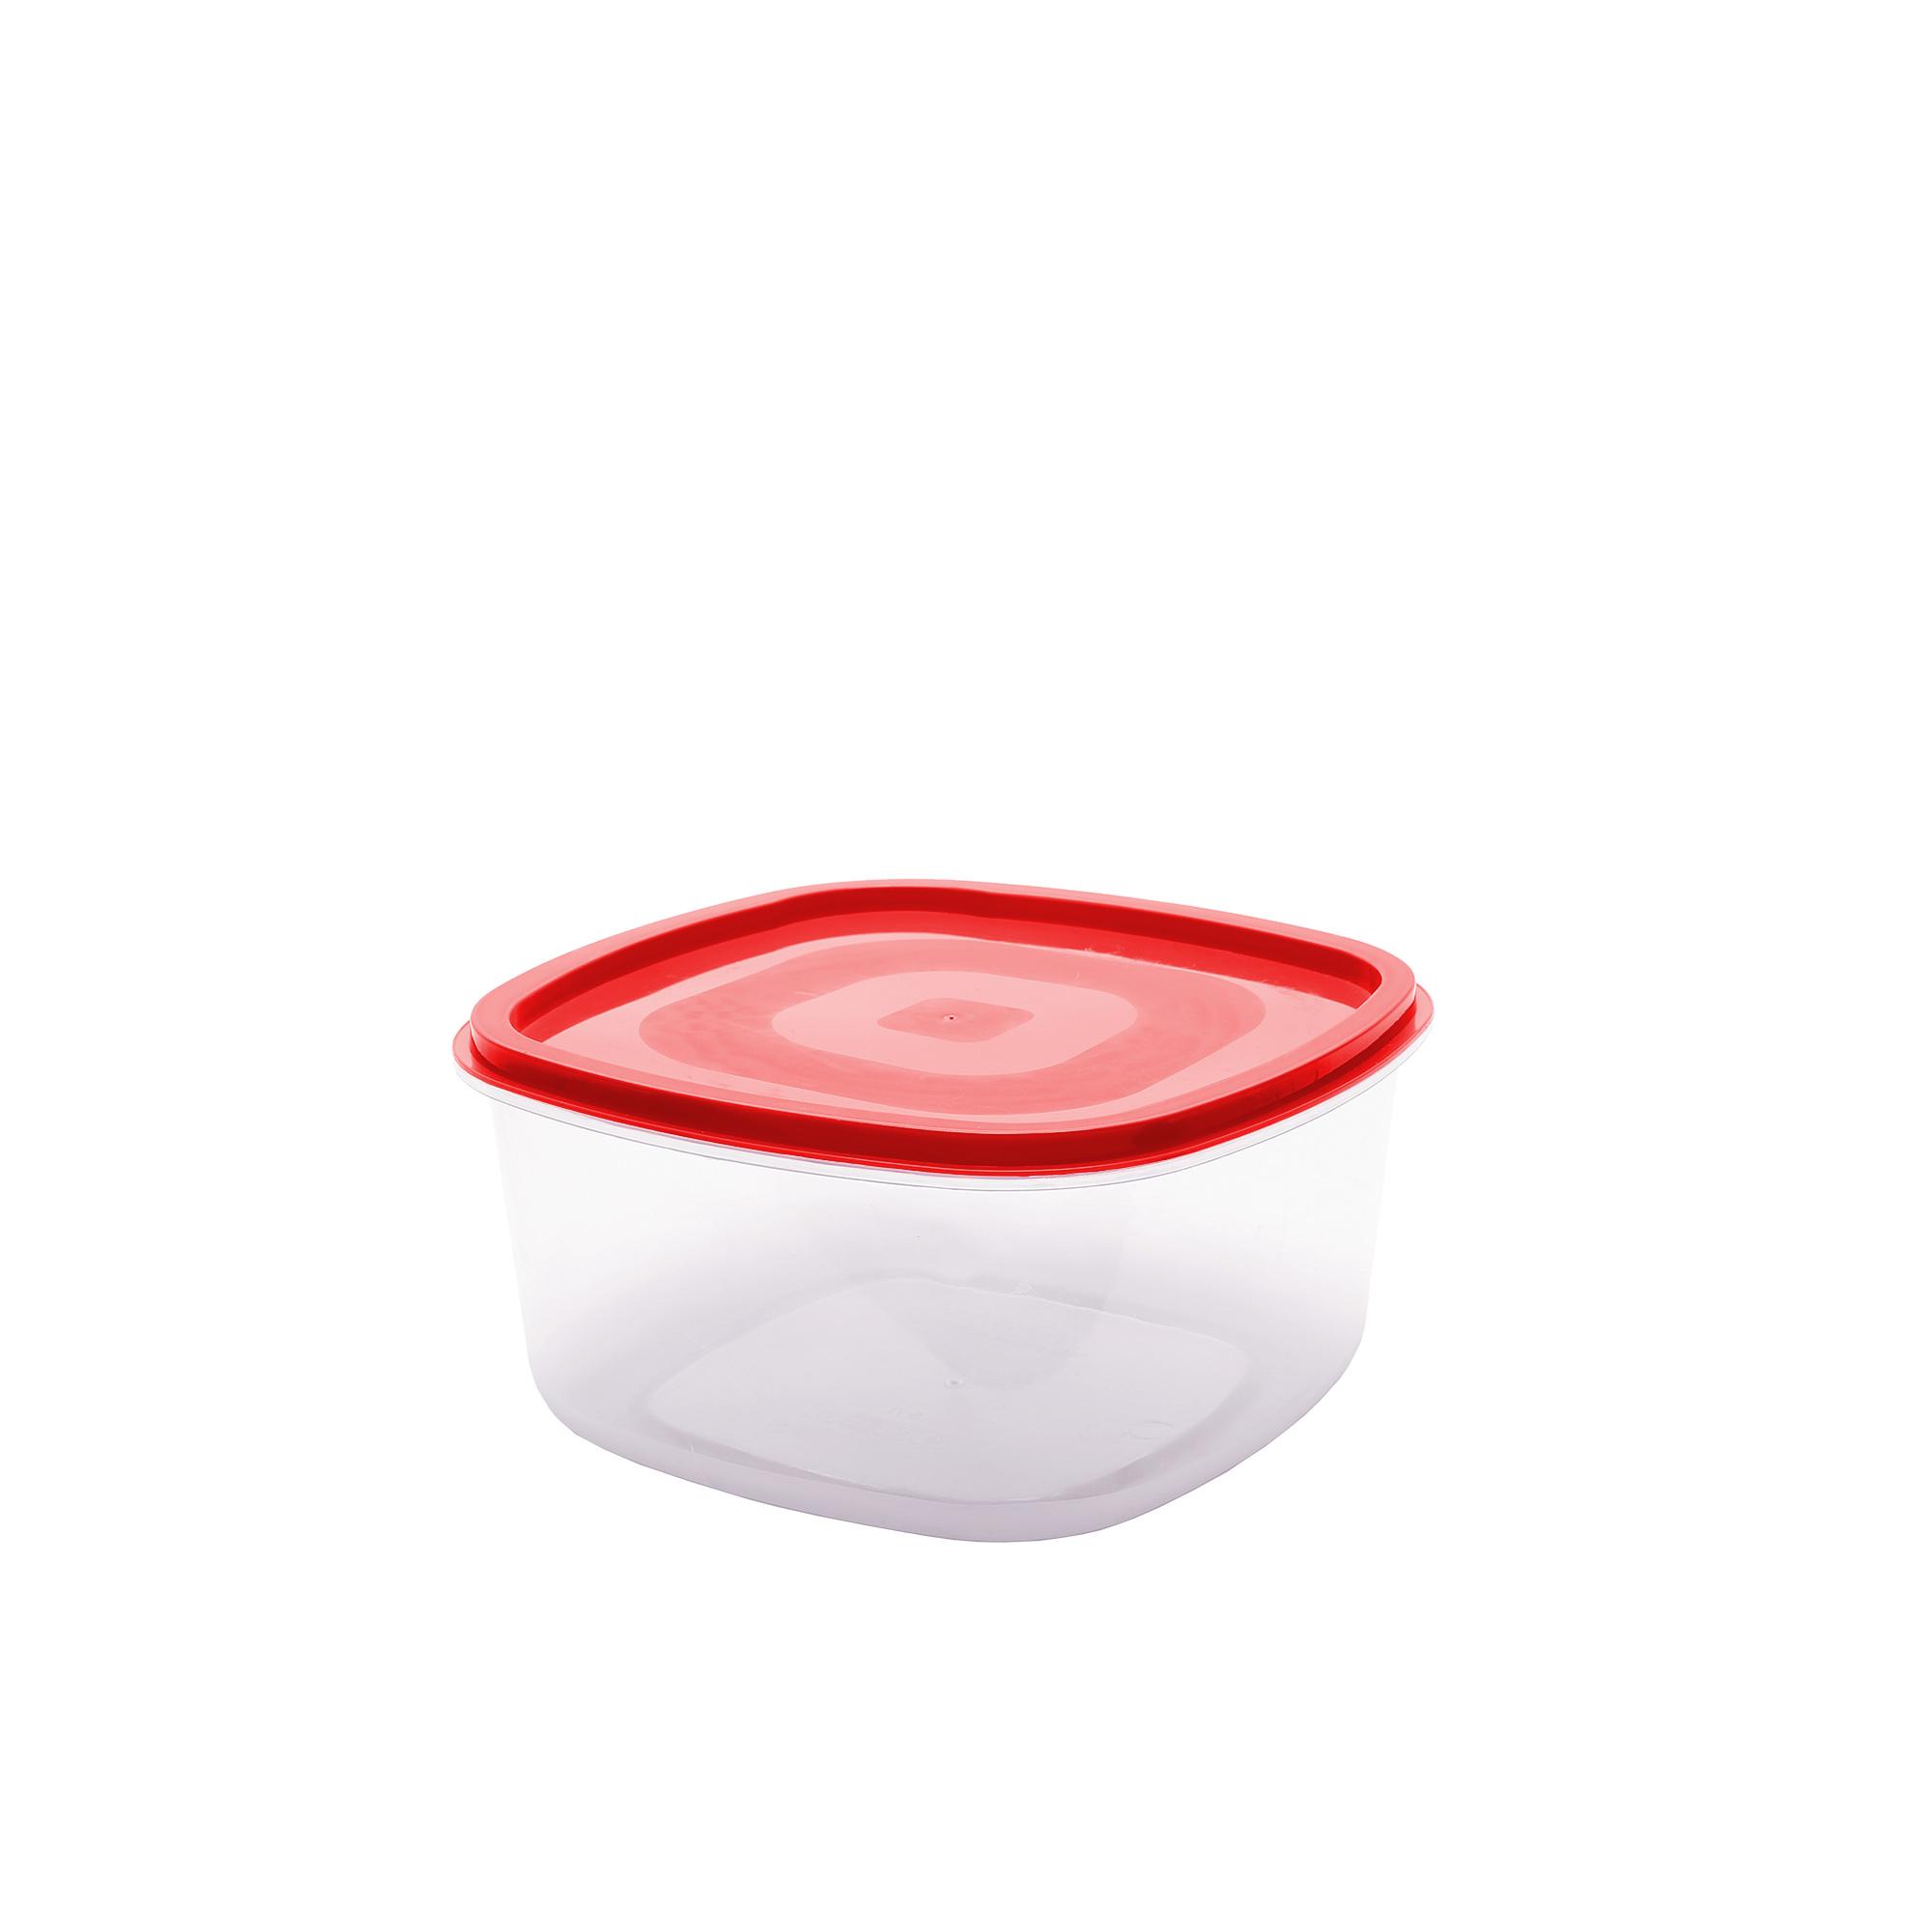 Pote Quadrado Liso 0.25 Lts - Vermelho